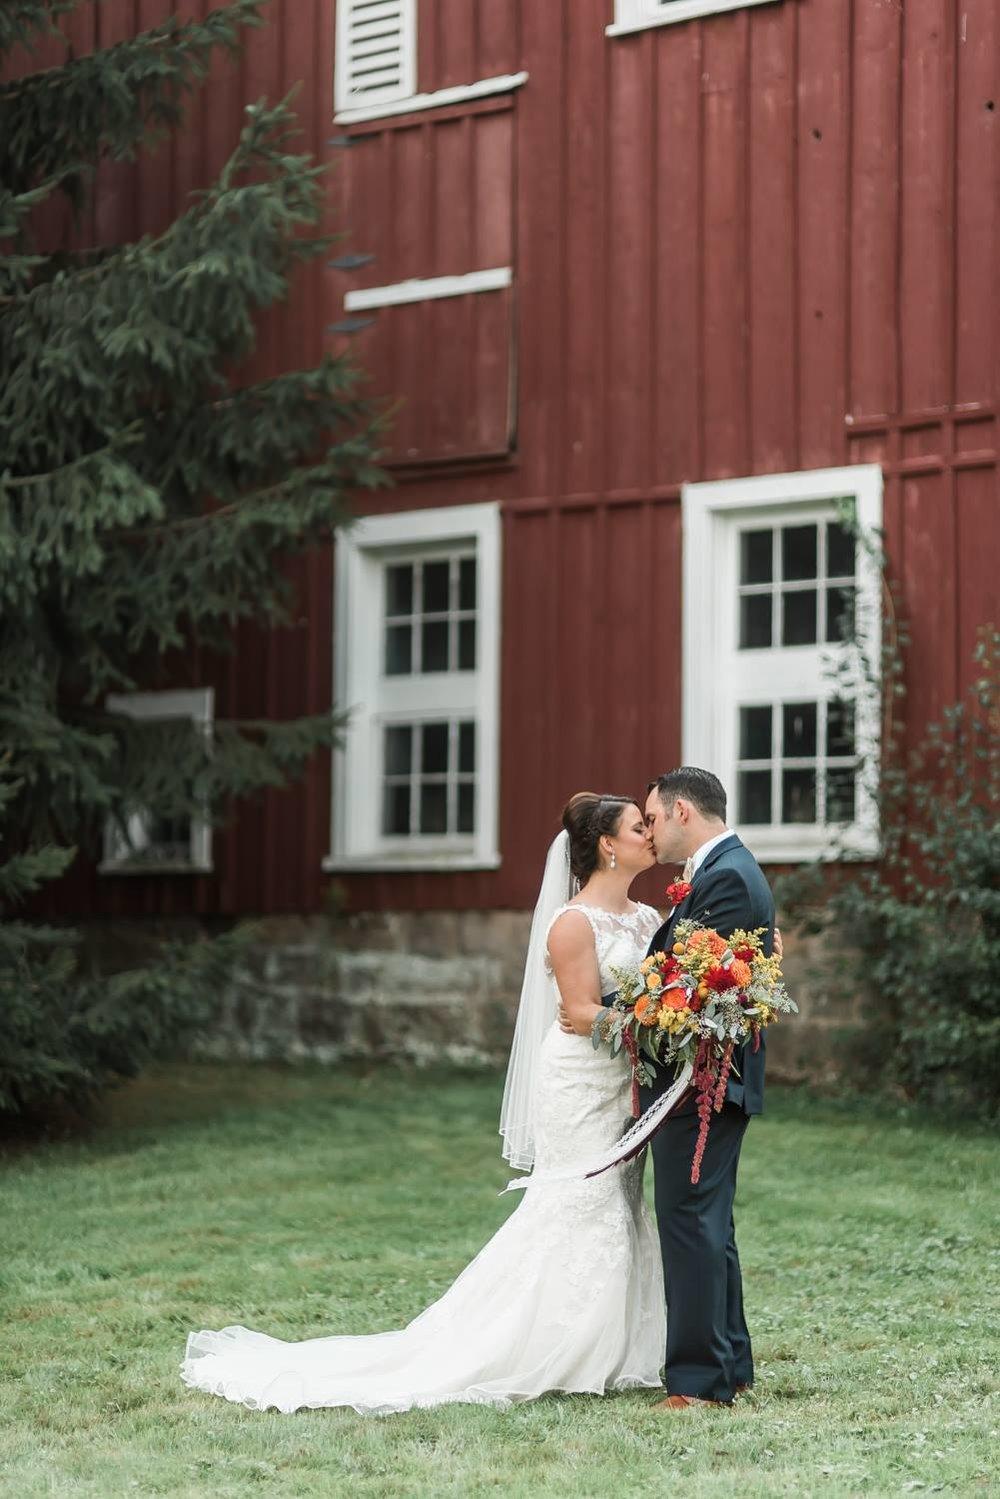 succop-conservancy-pennsylvania-outdoor-glam-jewel-tone-fall-autumn-wedding-0017.jpg